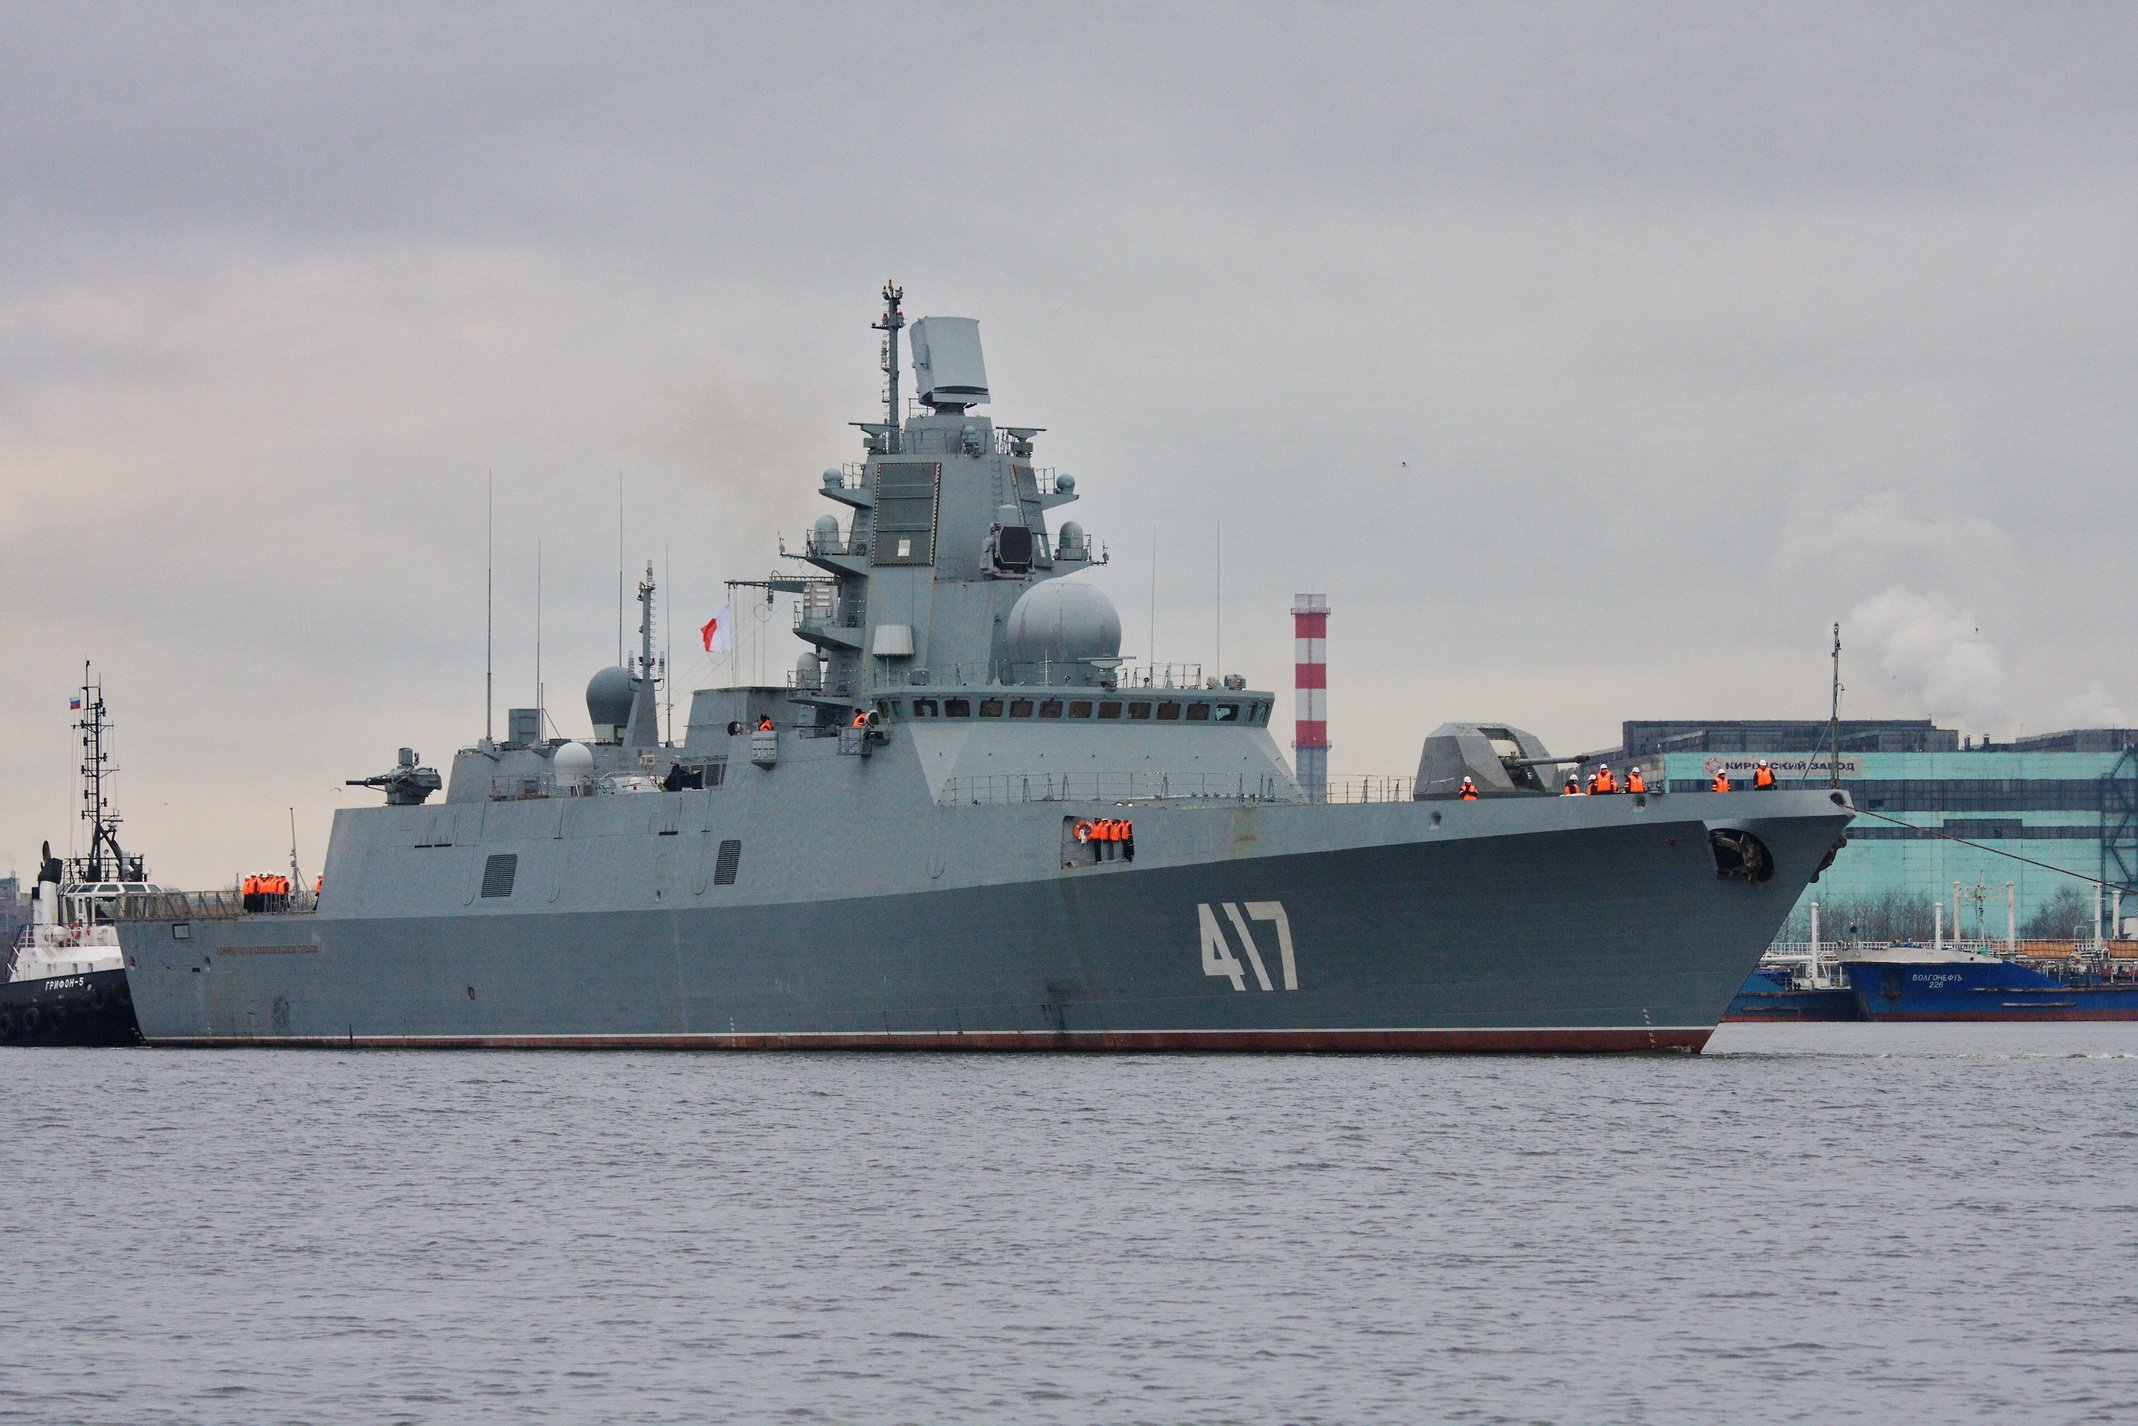 U.S. Warship Shadowing High-End Russian Frigate Near Cuba - USNI News